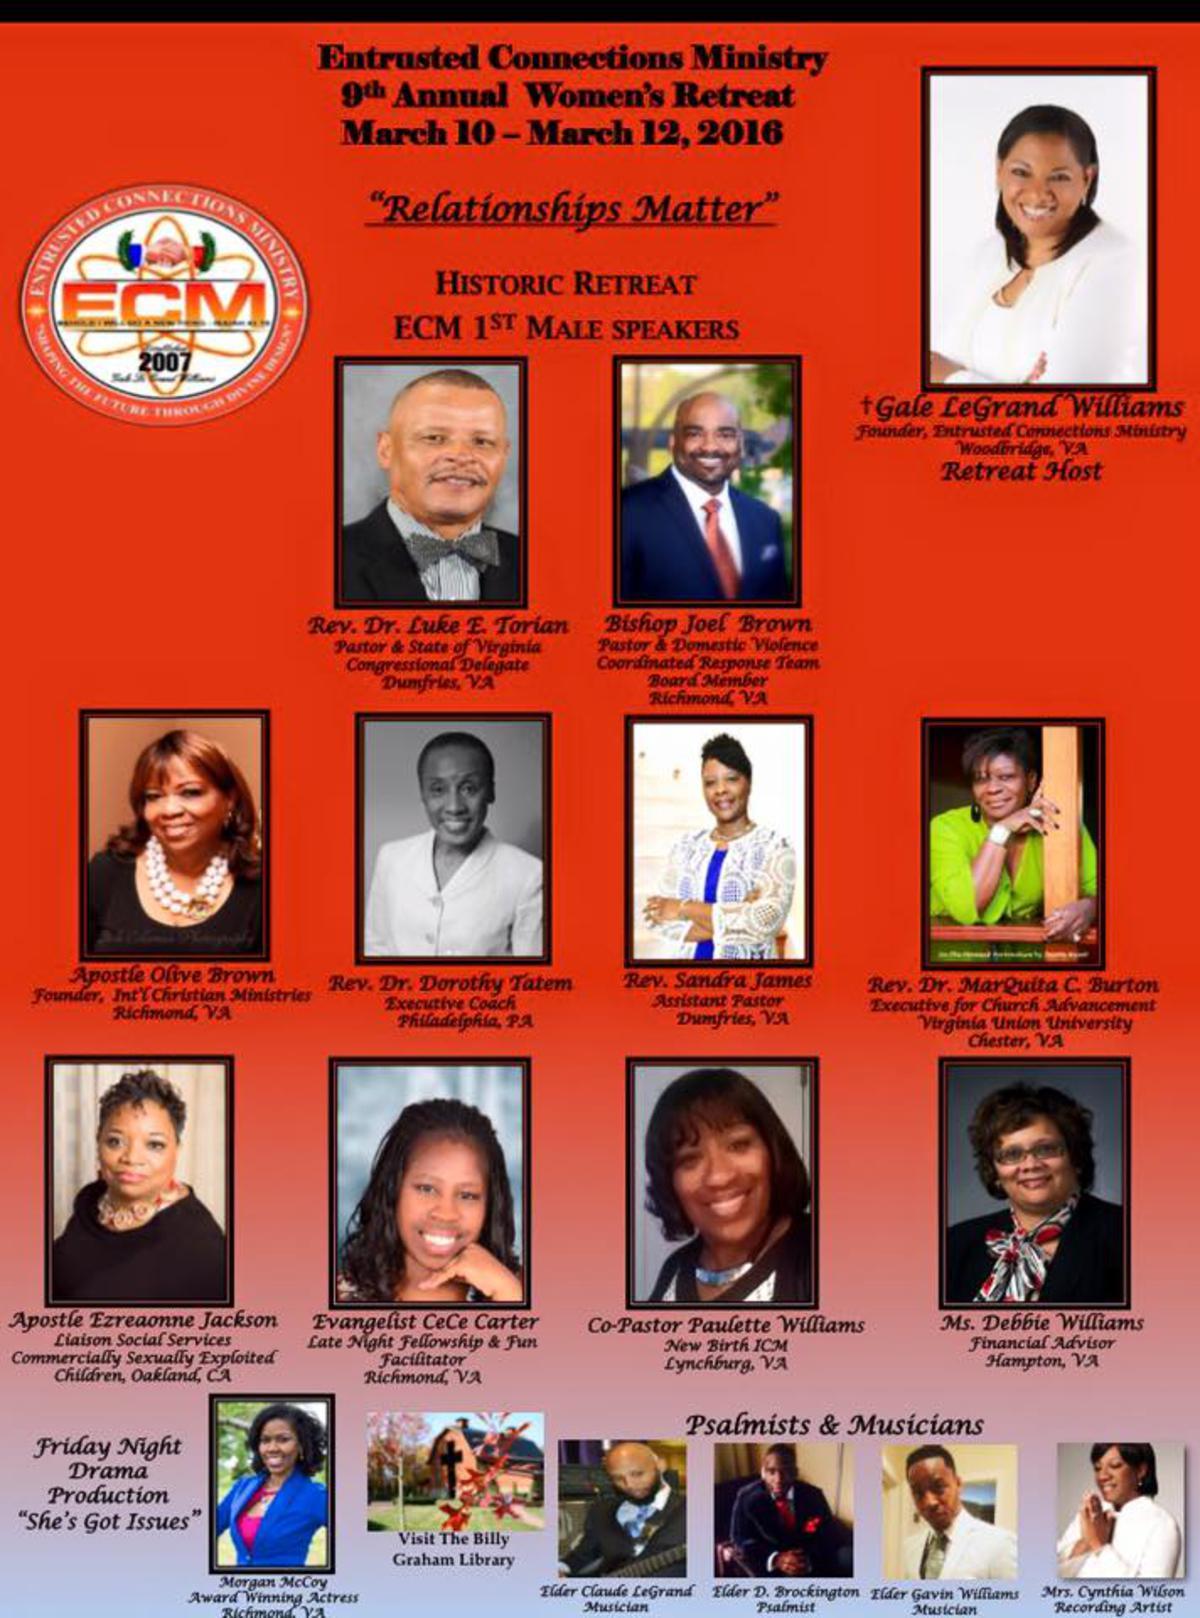 ECM 9th Annual Women's Retreat